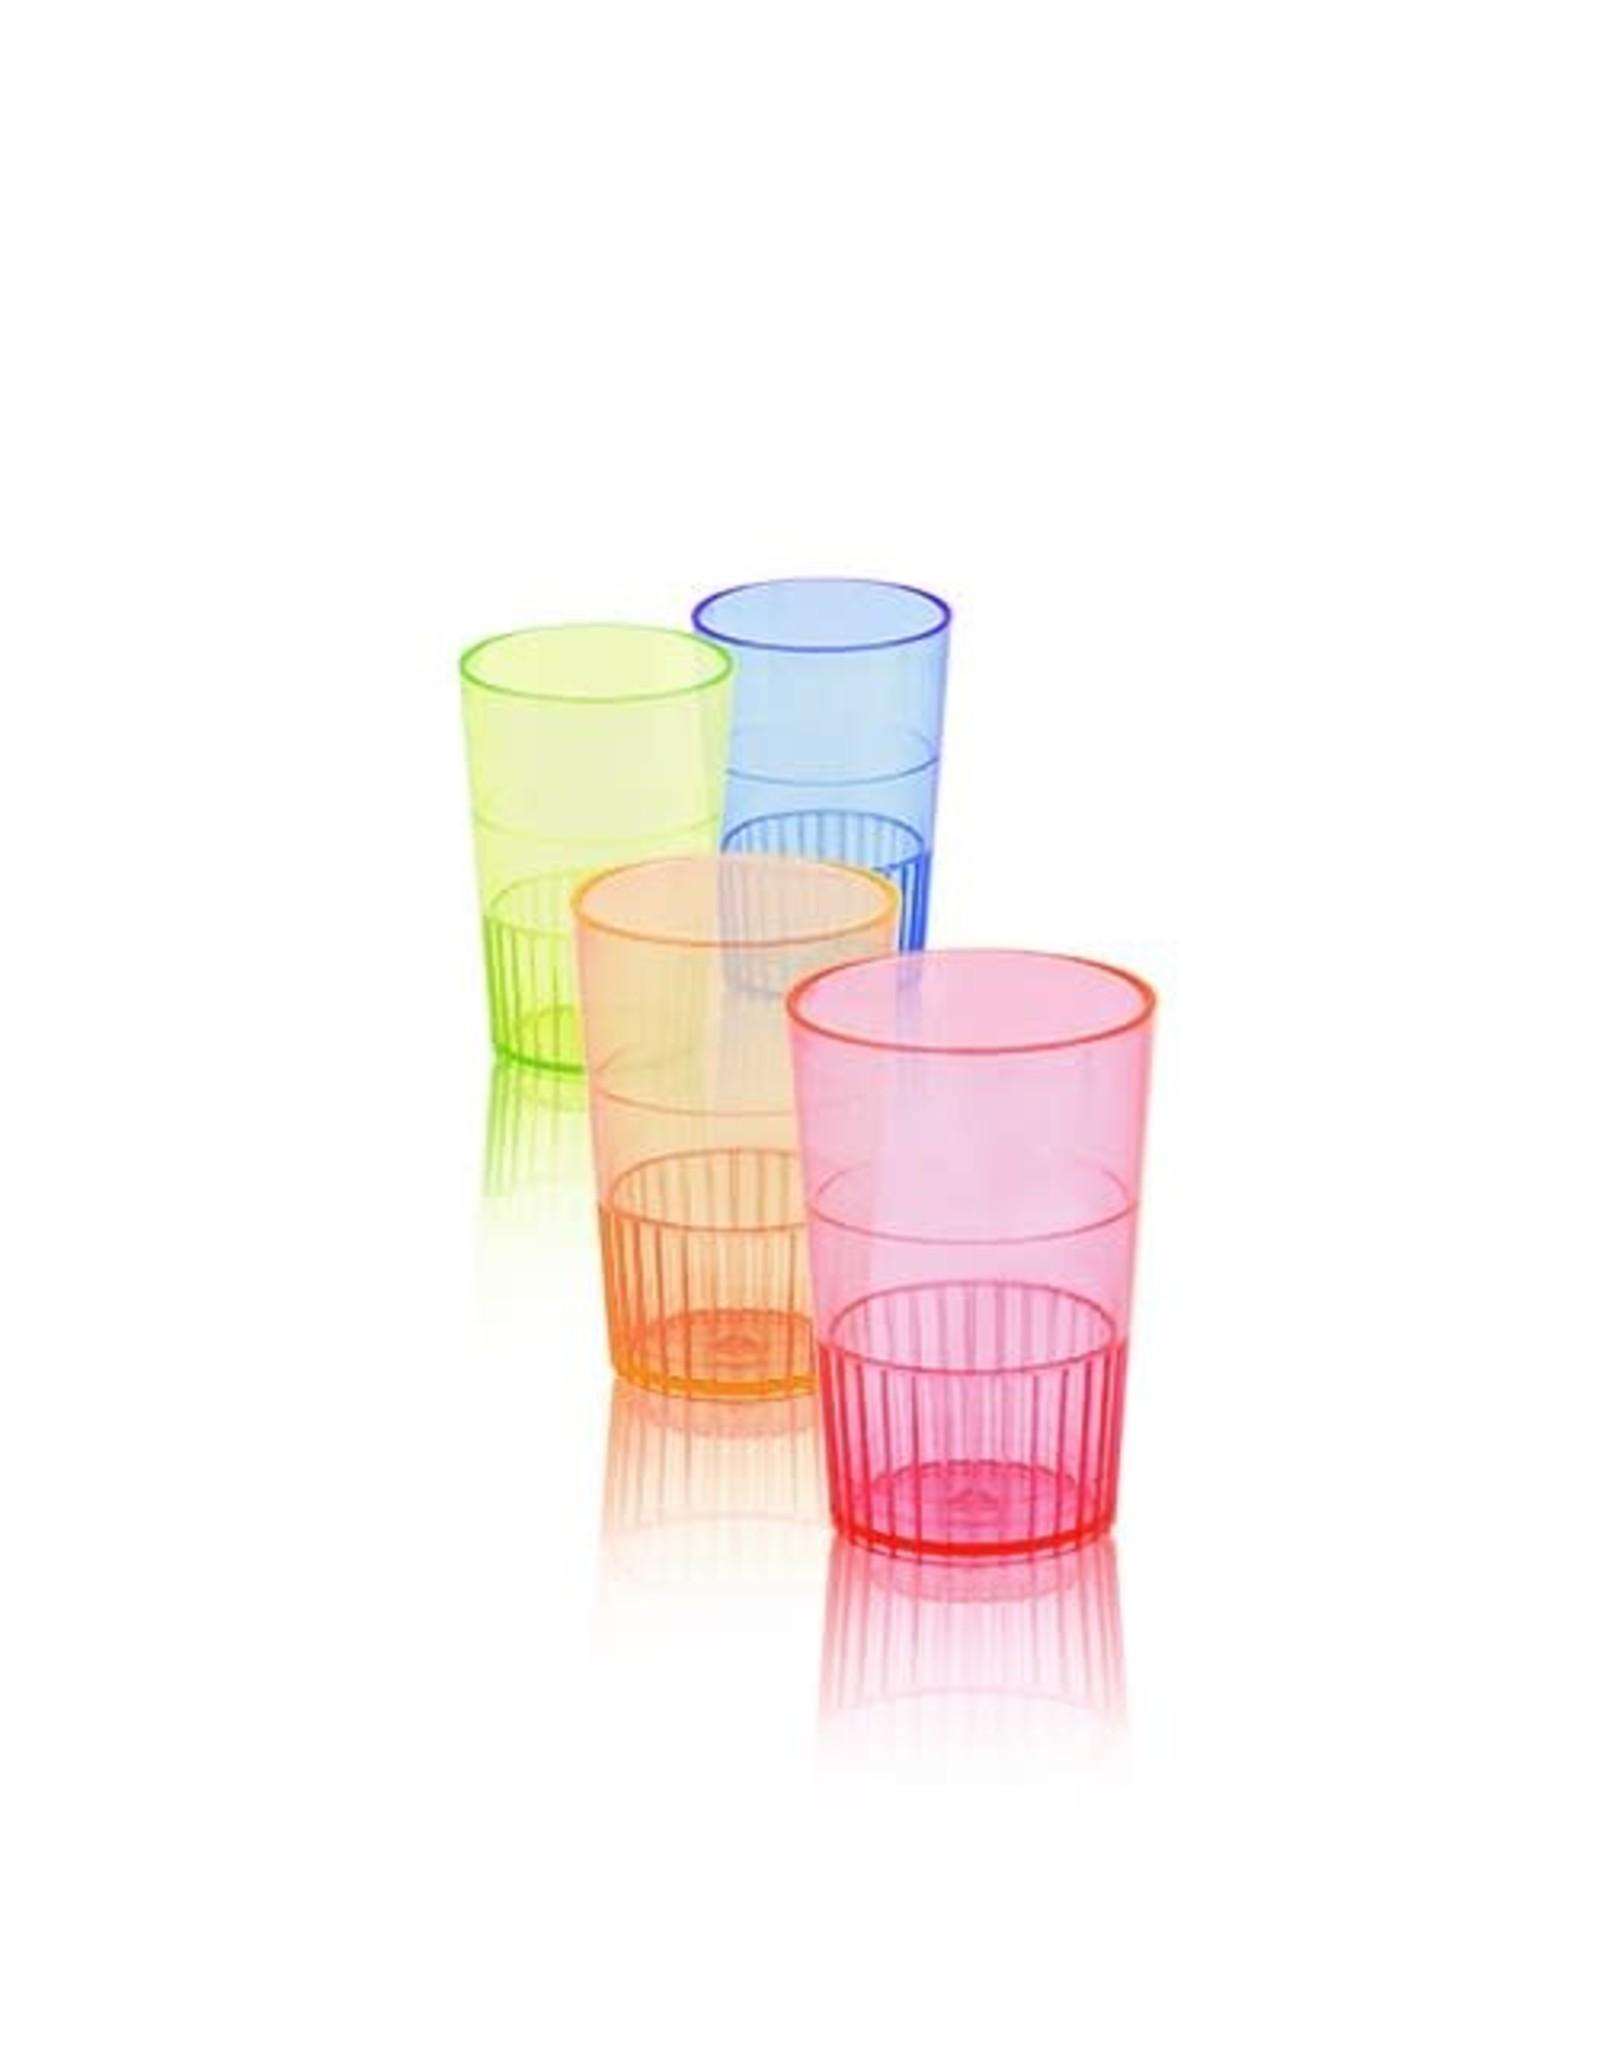 HOTSHOTS PARTY SHOT GLASS